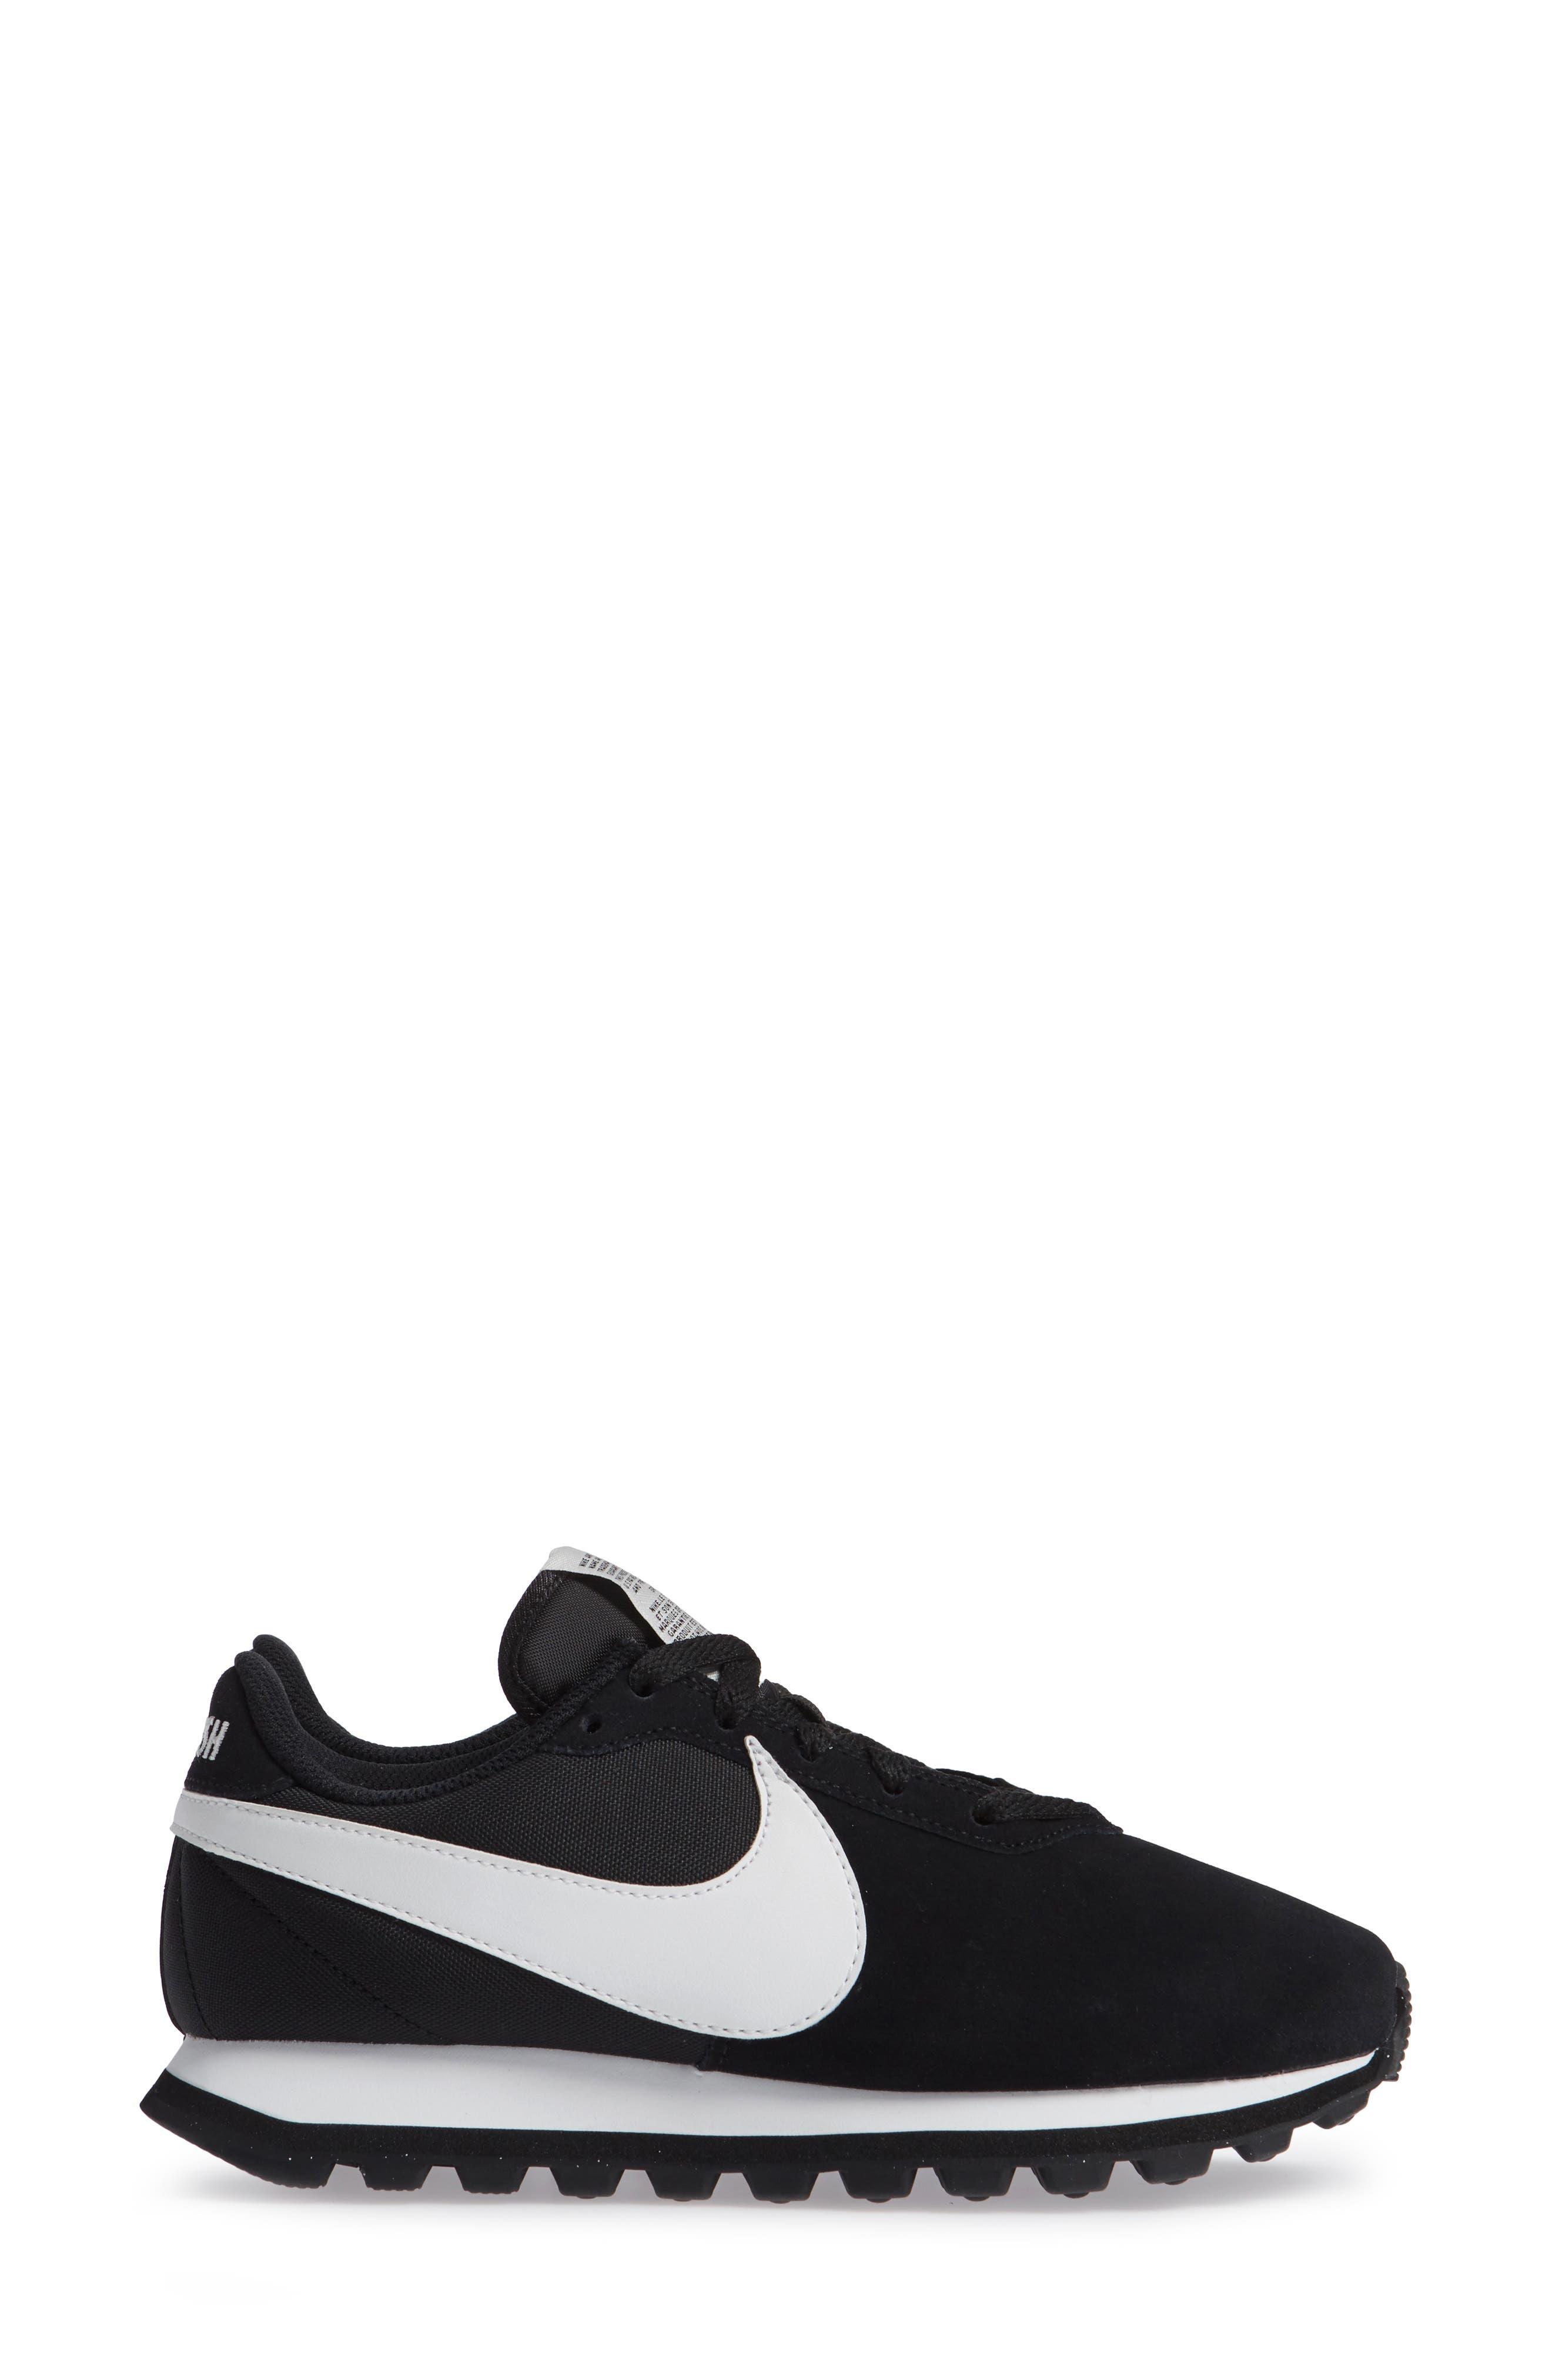 Pre Love O.X. Sneaker,                             Alternate thumbnail 4, color,                             Black/ Summit White